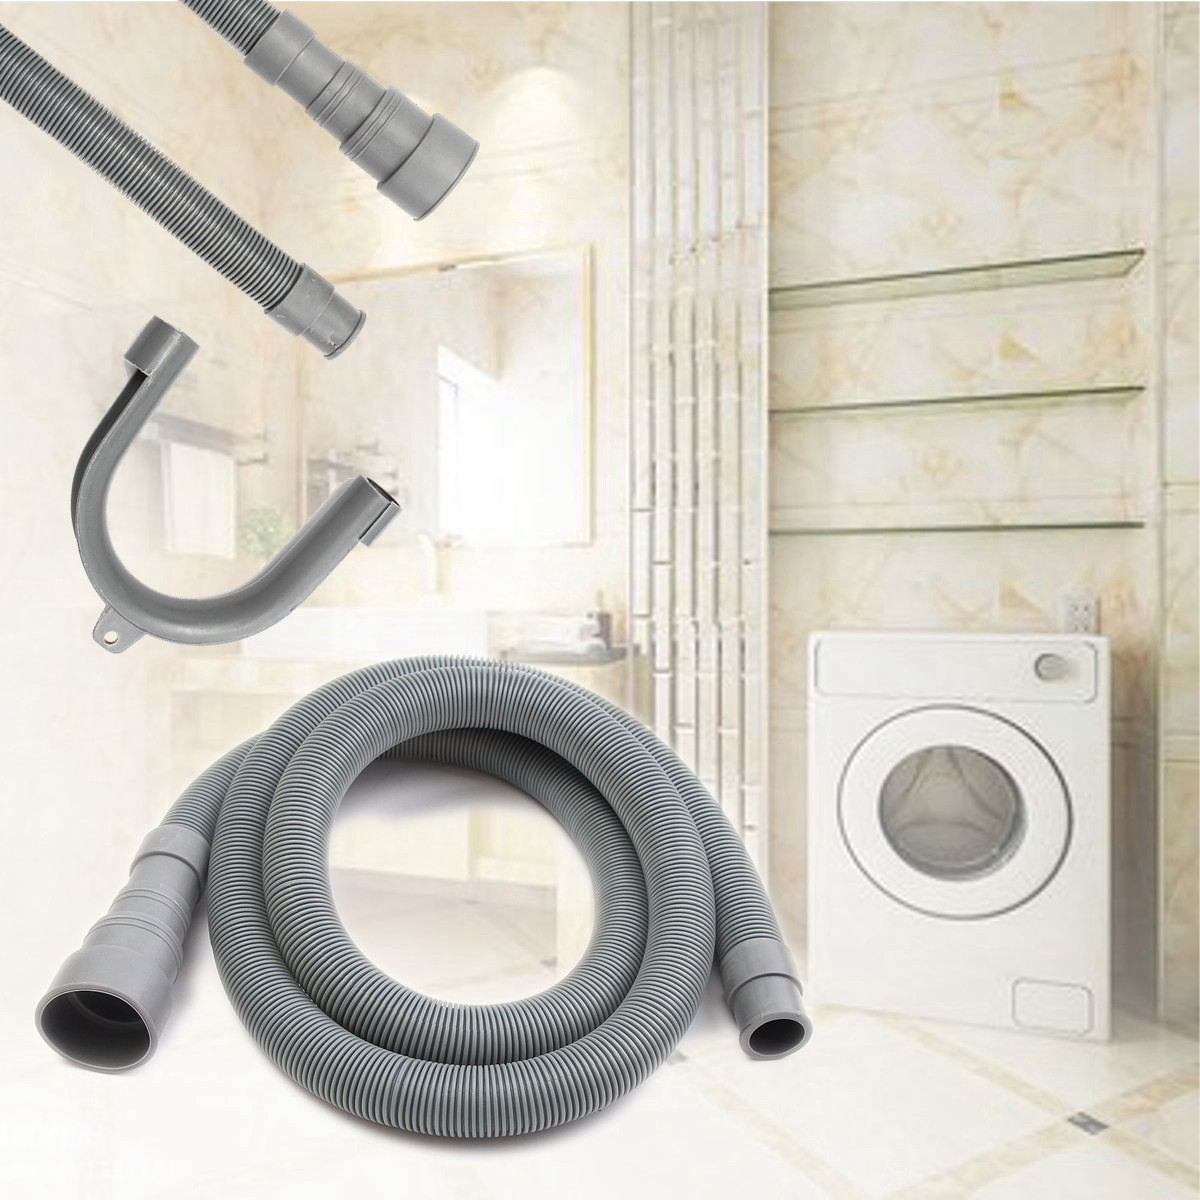 1Pcs 2.5M/3M PVC Washing Machine Dishwasher Drain Waste Hose Extension Pipe With Bracket Set Wash Machine Ablaufschlauch b1jx self washing machine pvc inlet pipe white silvery grey 2 8m